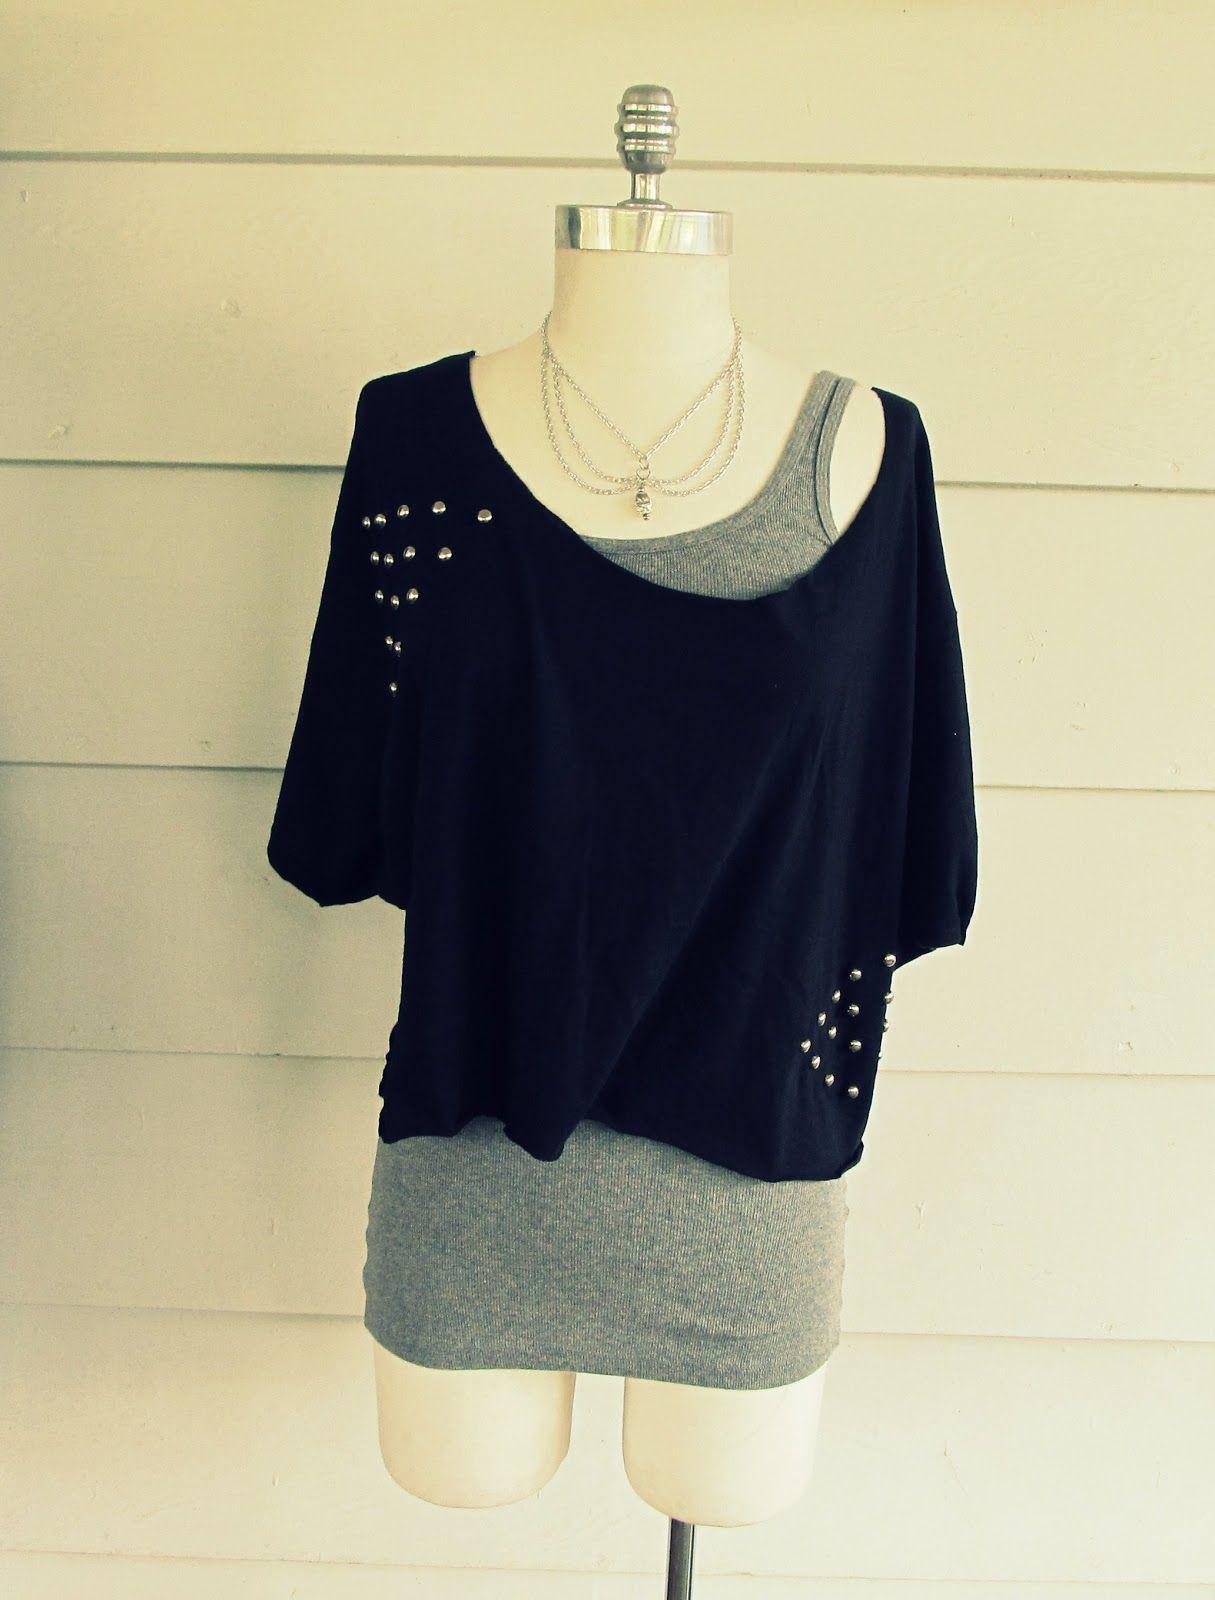 f the Shoulder Triangle Stud Tee Shirt DIY